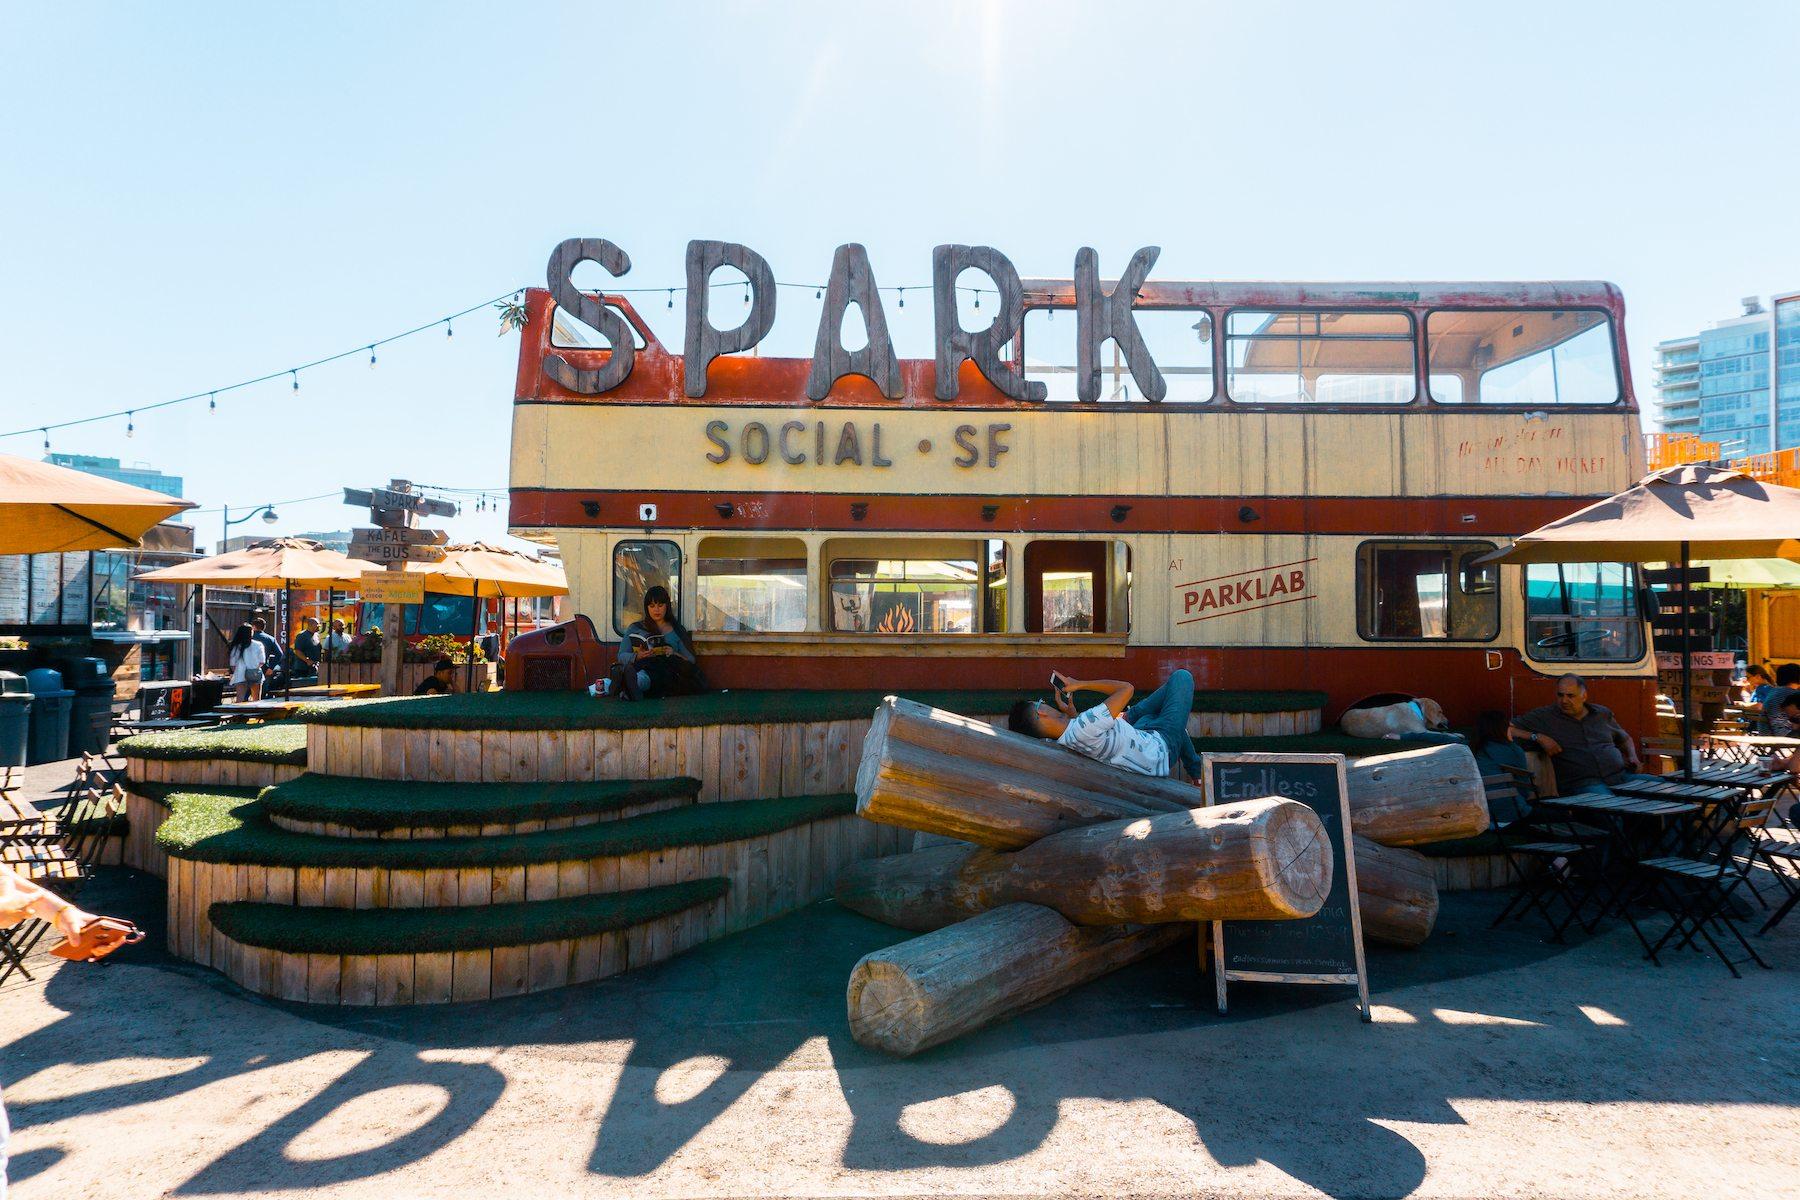 Spark Social SF. Photo: Justin Wong, 49miles.com.